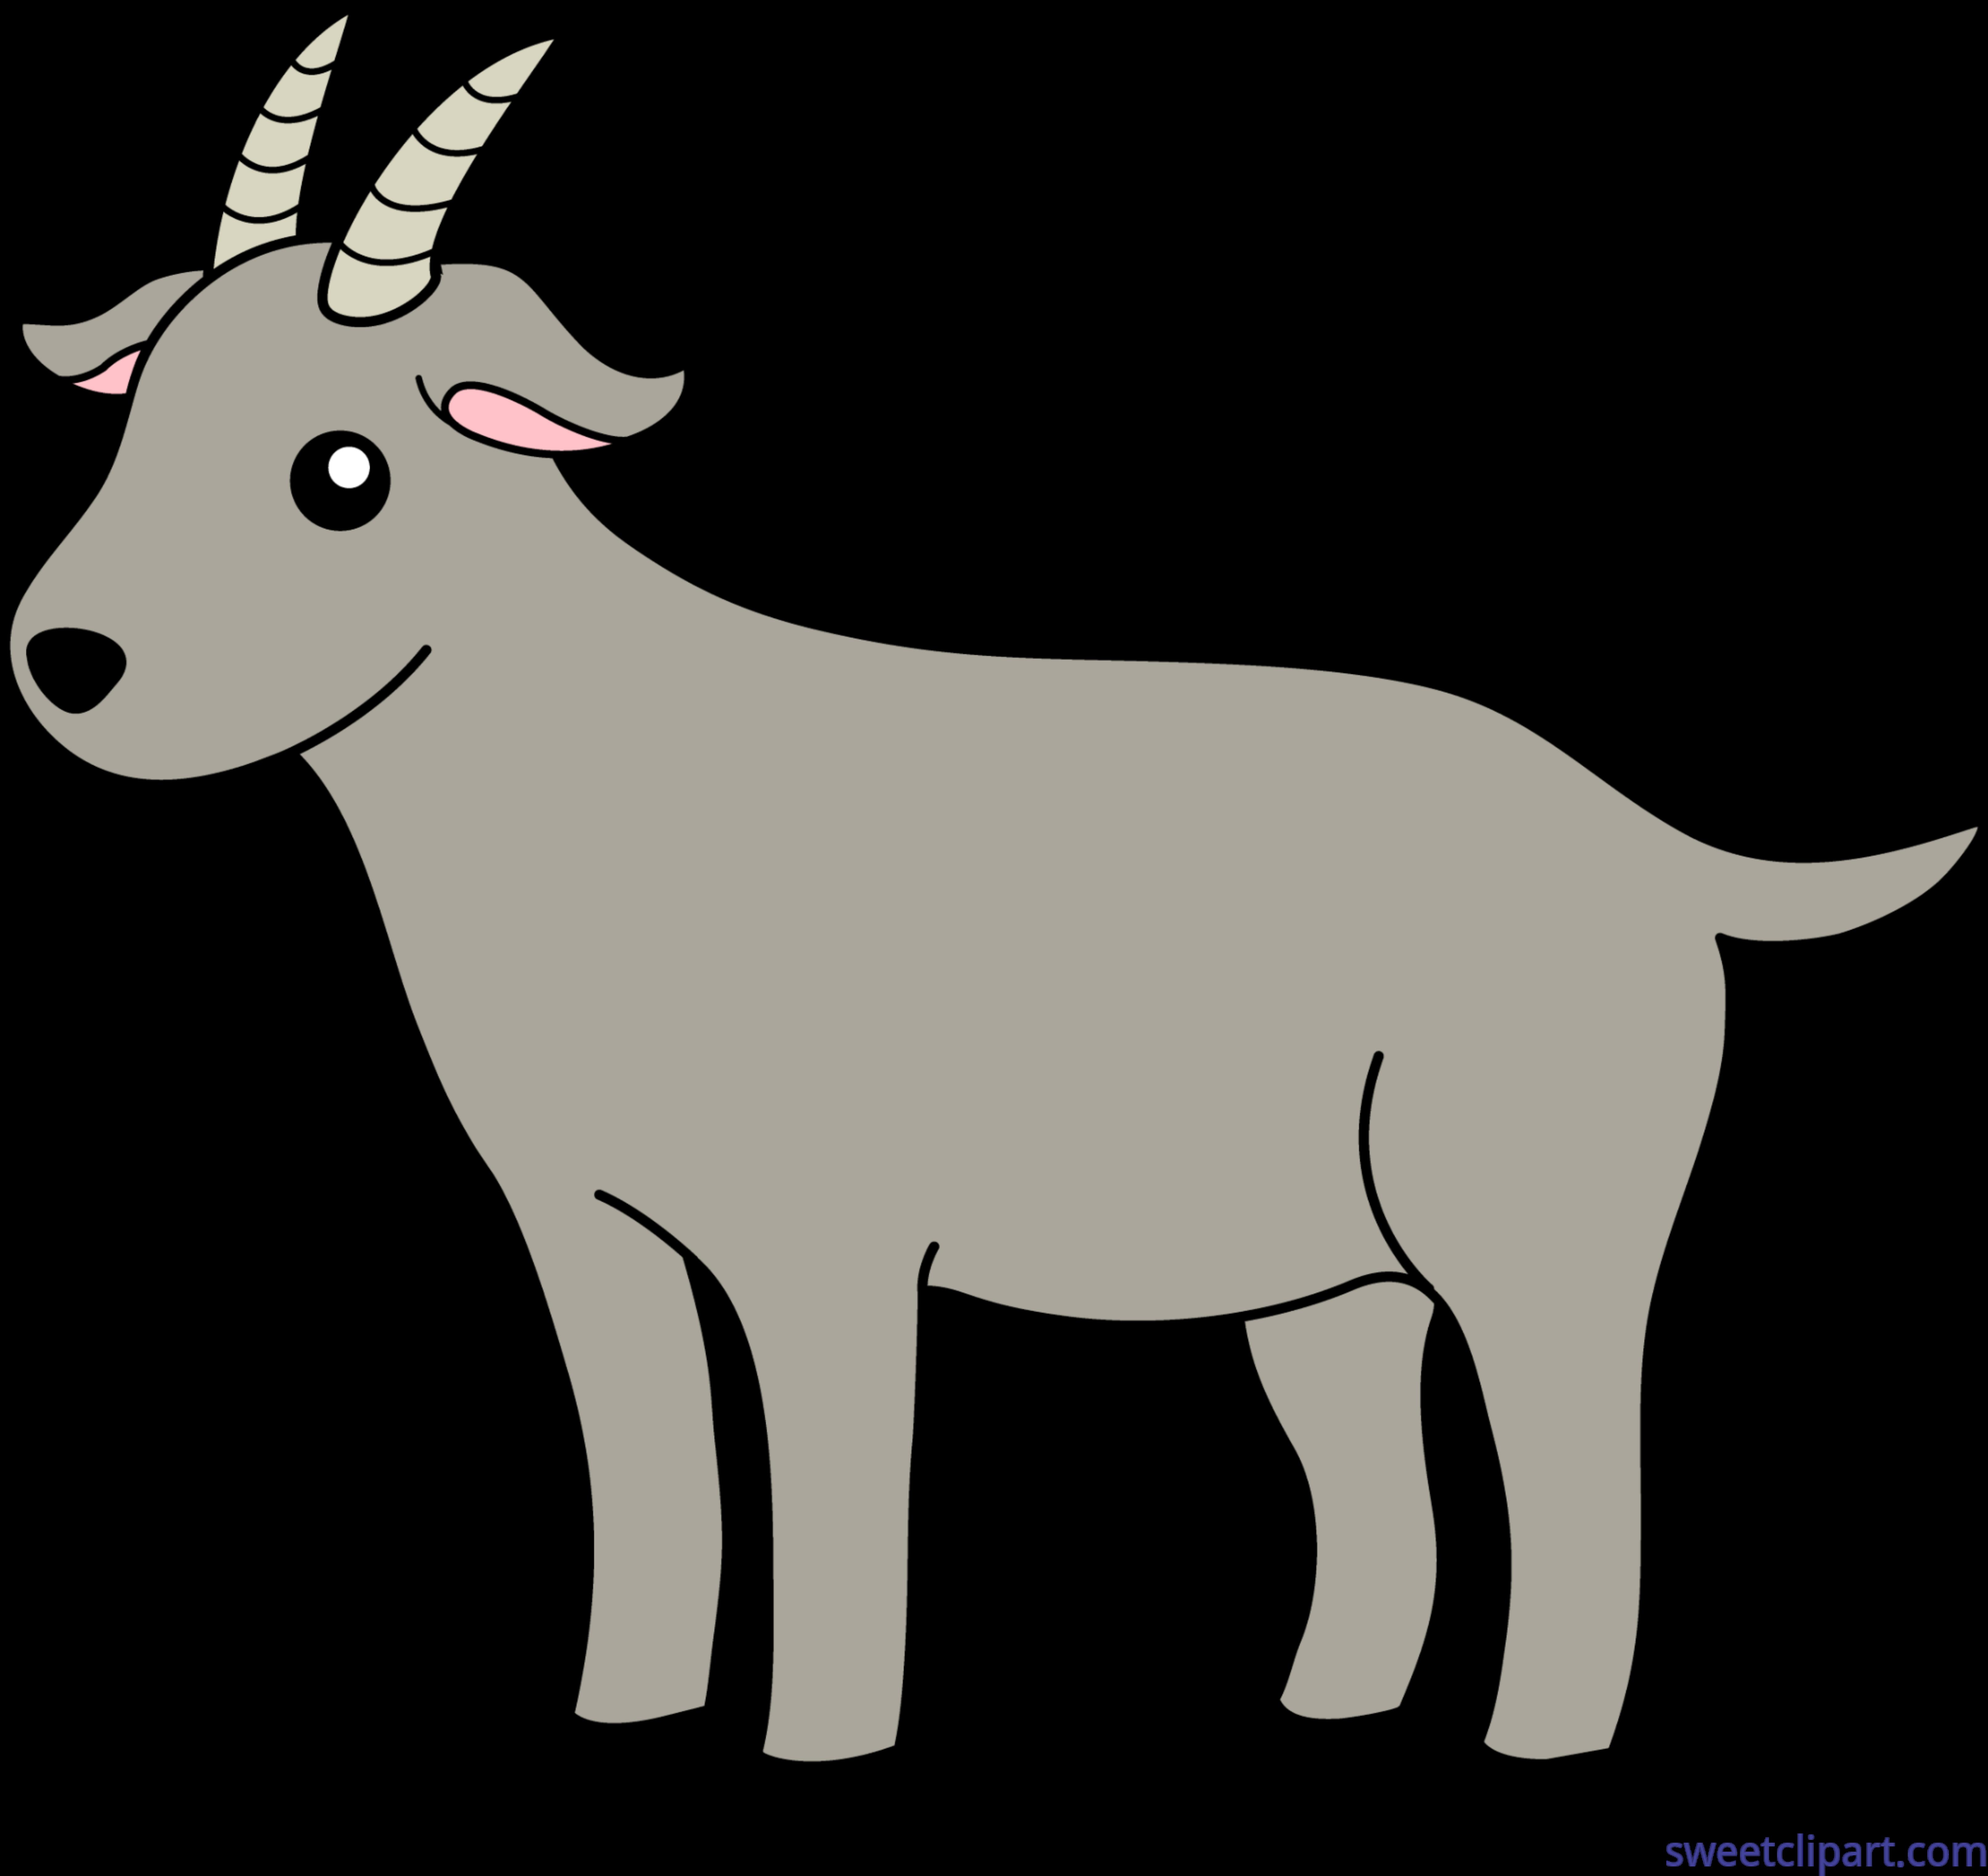 Goat clipart carton. Clip art sweet